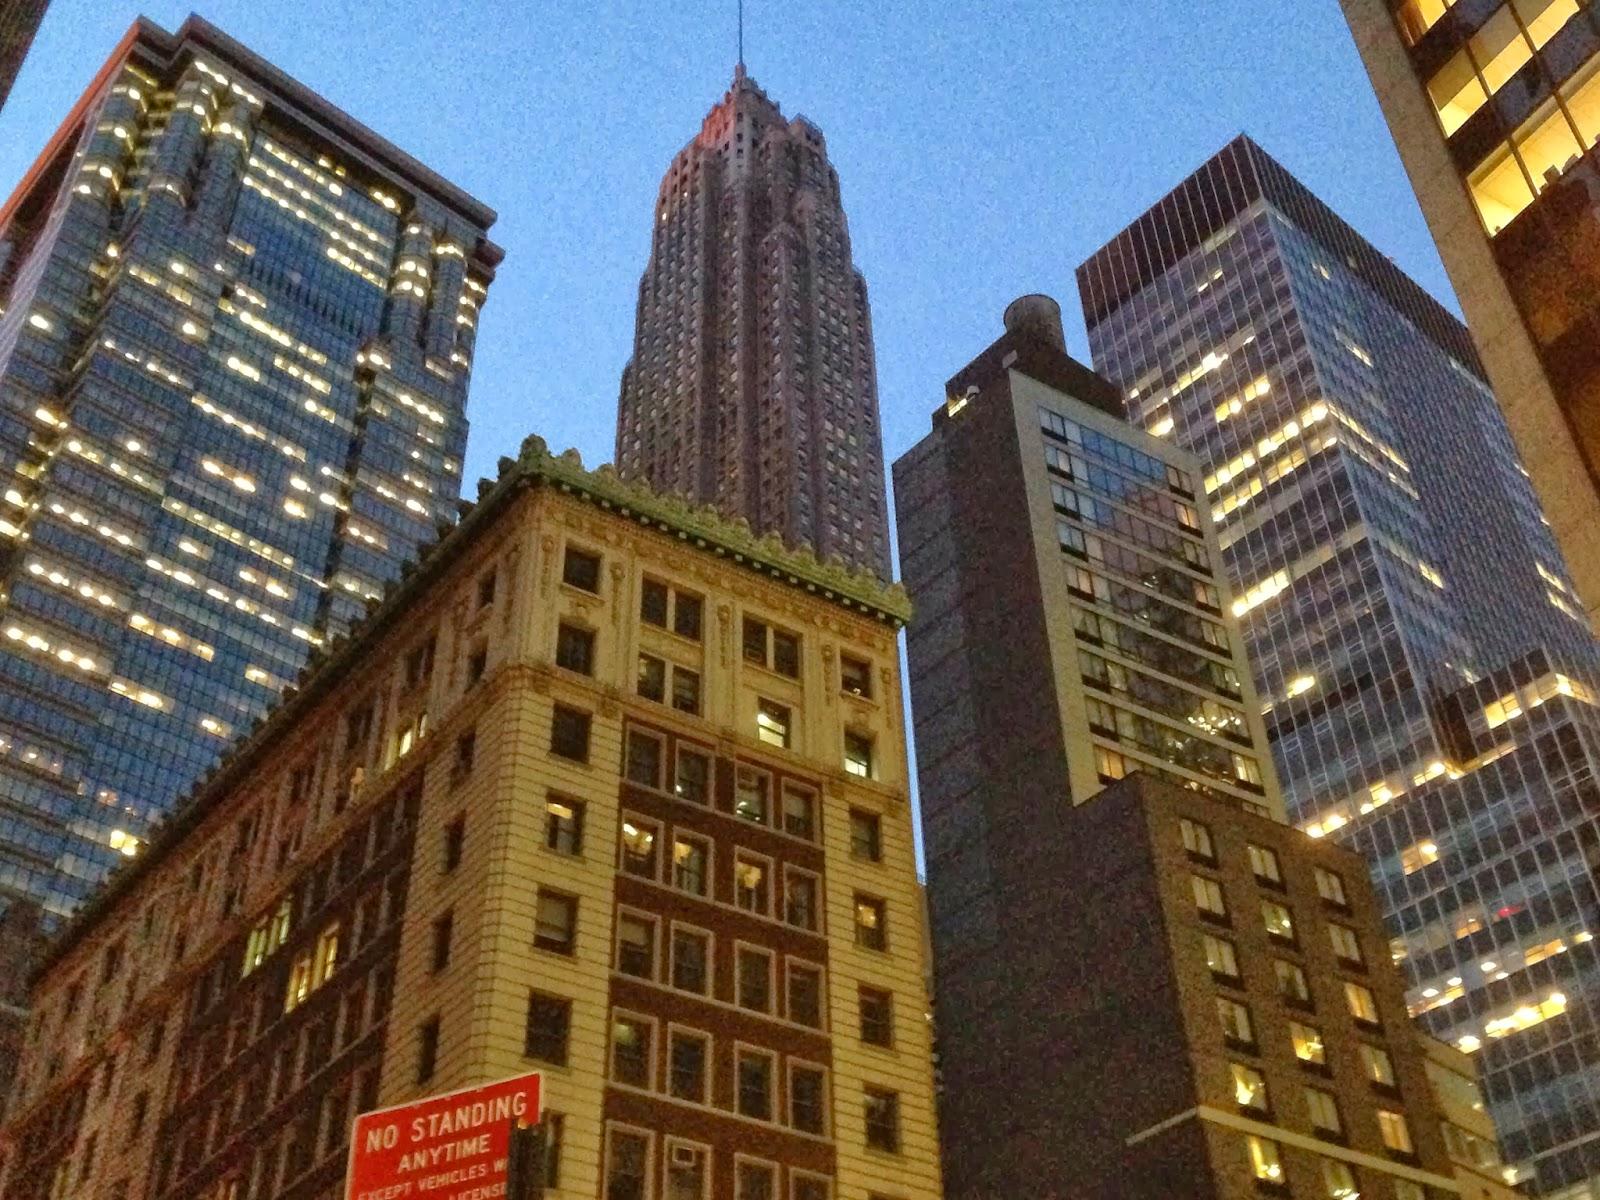 journal d 39 un tour du monde new york am i to be blamed. Black Bedroom Furniture Sets. Home Design Ideas